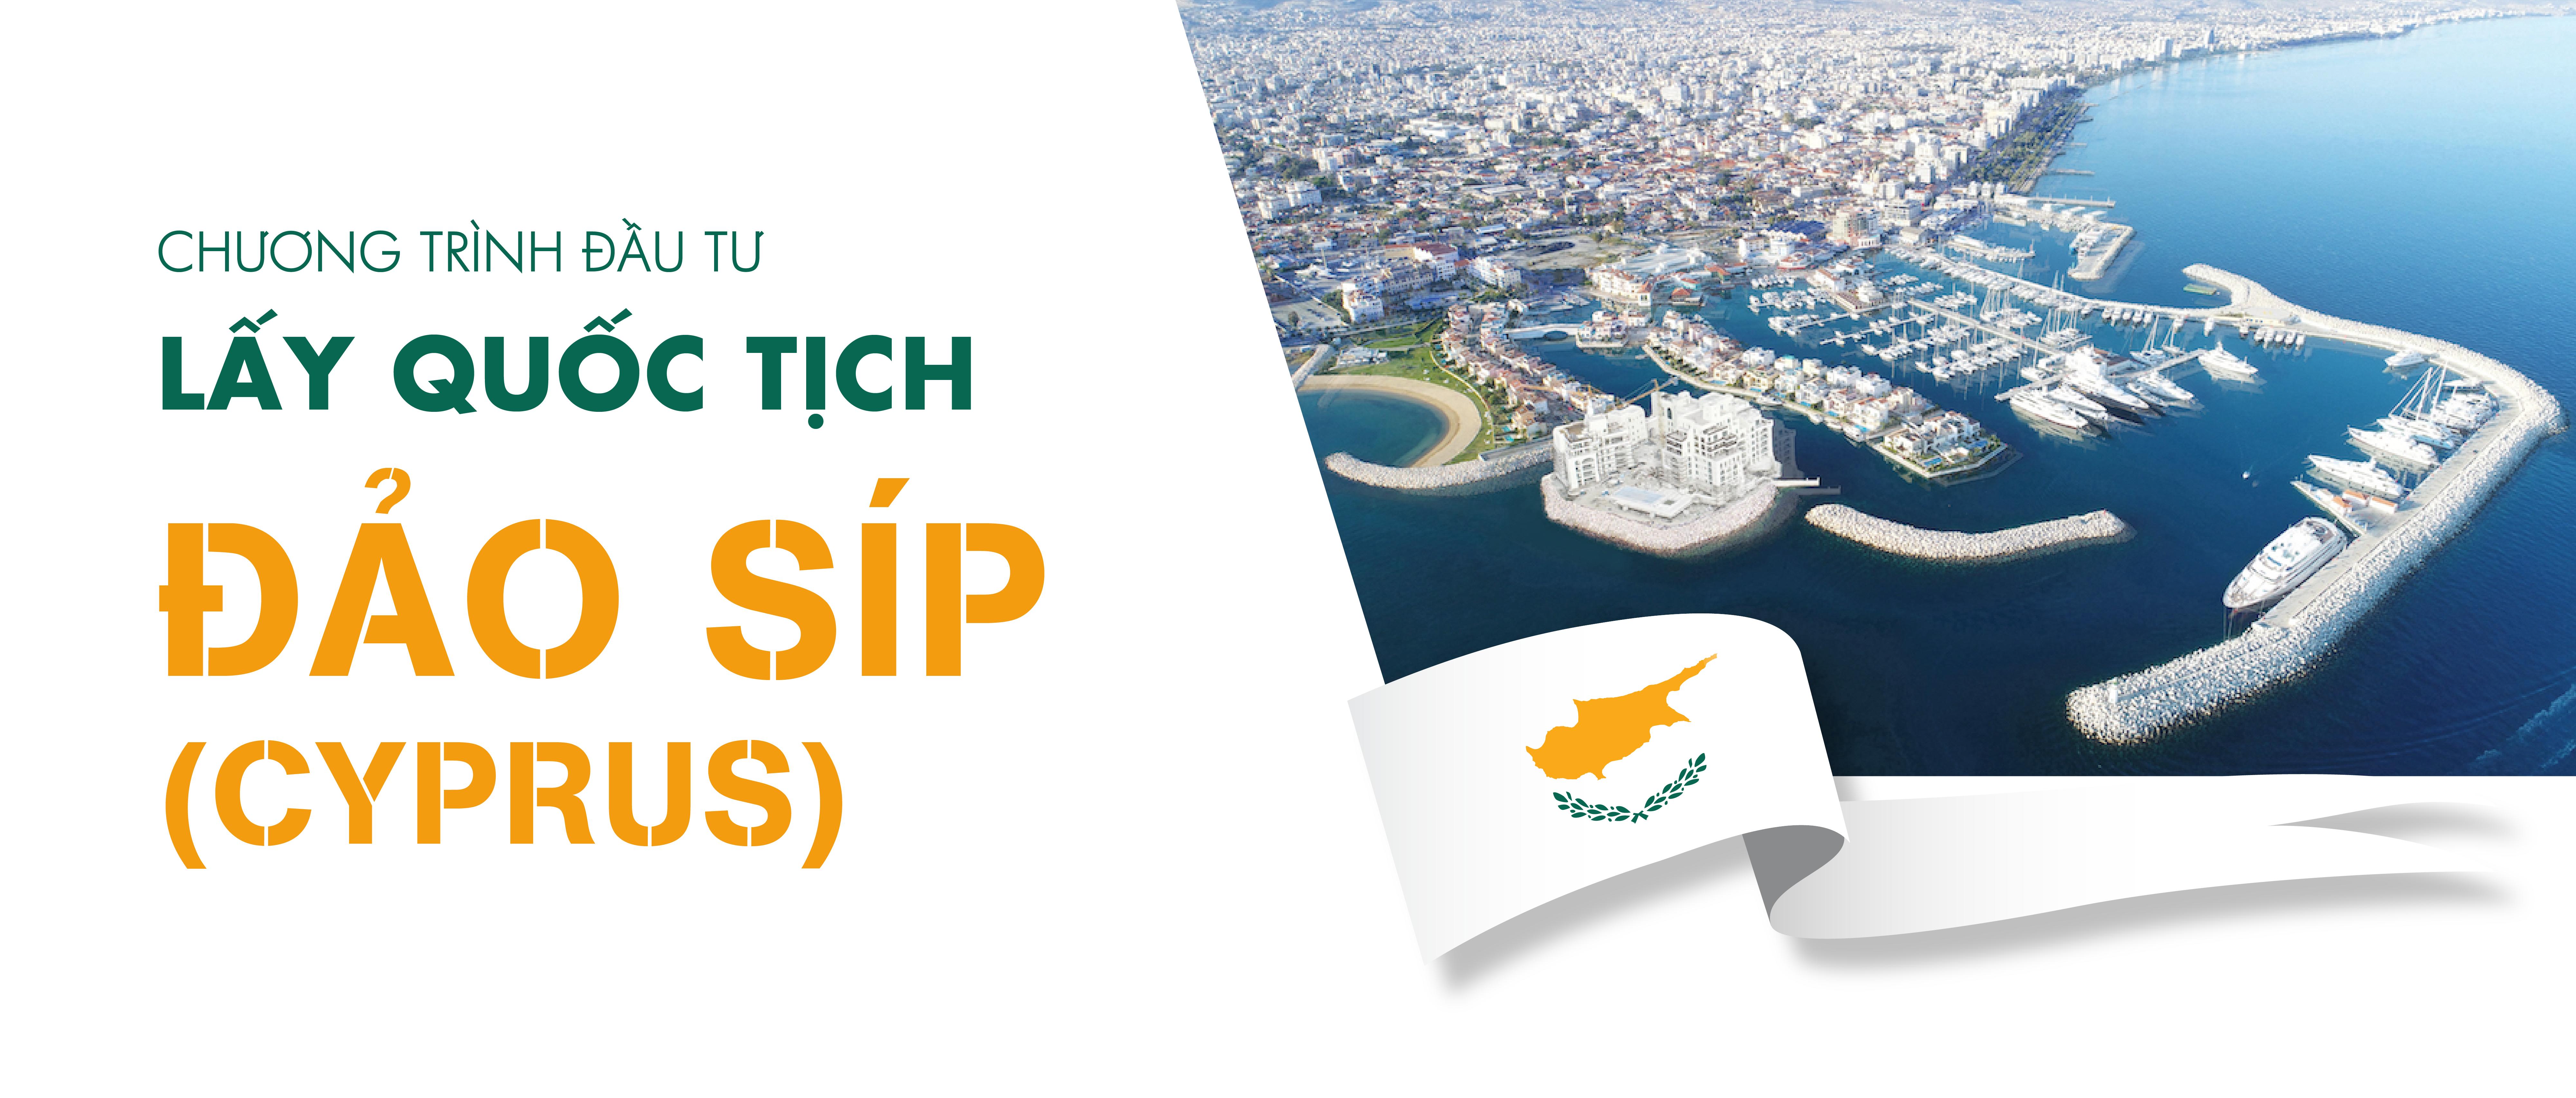 web Đảo Síp (Cyprus).2_SASKATCHEWAN copy 3